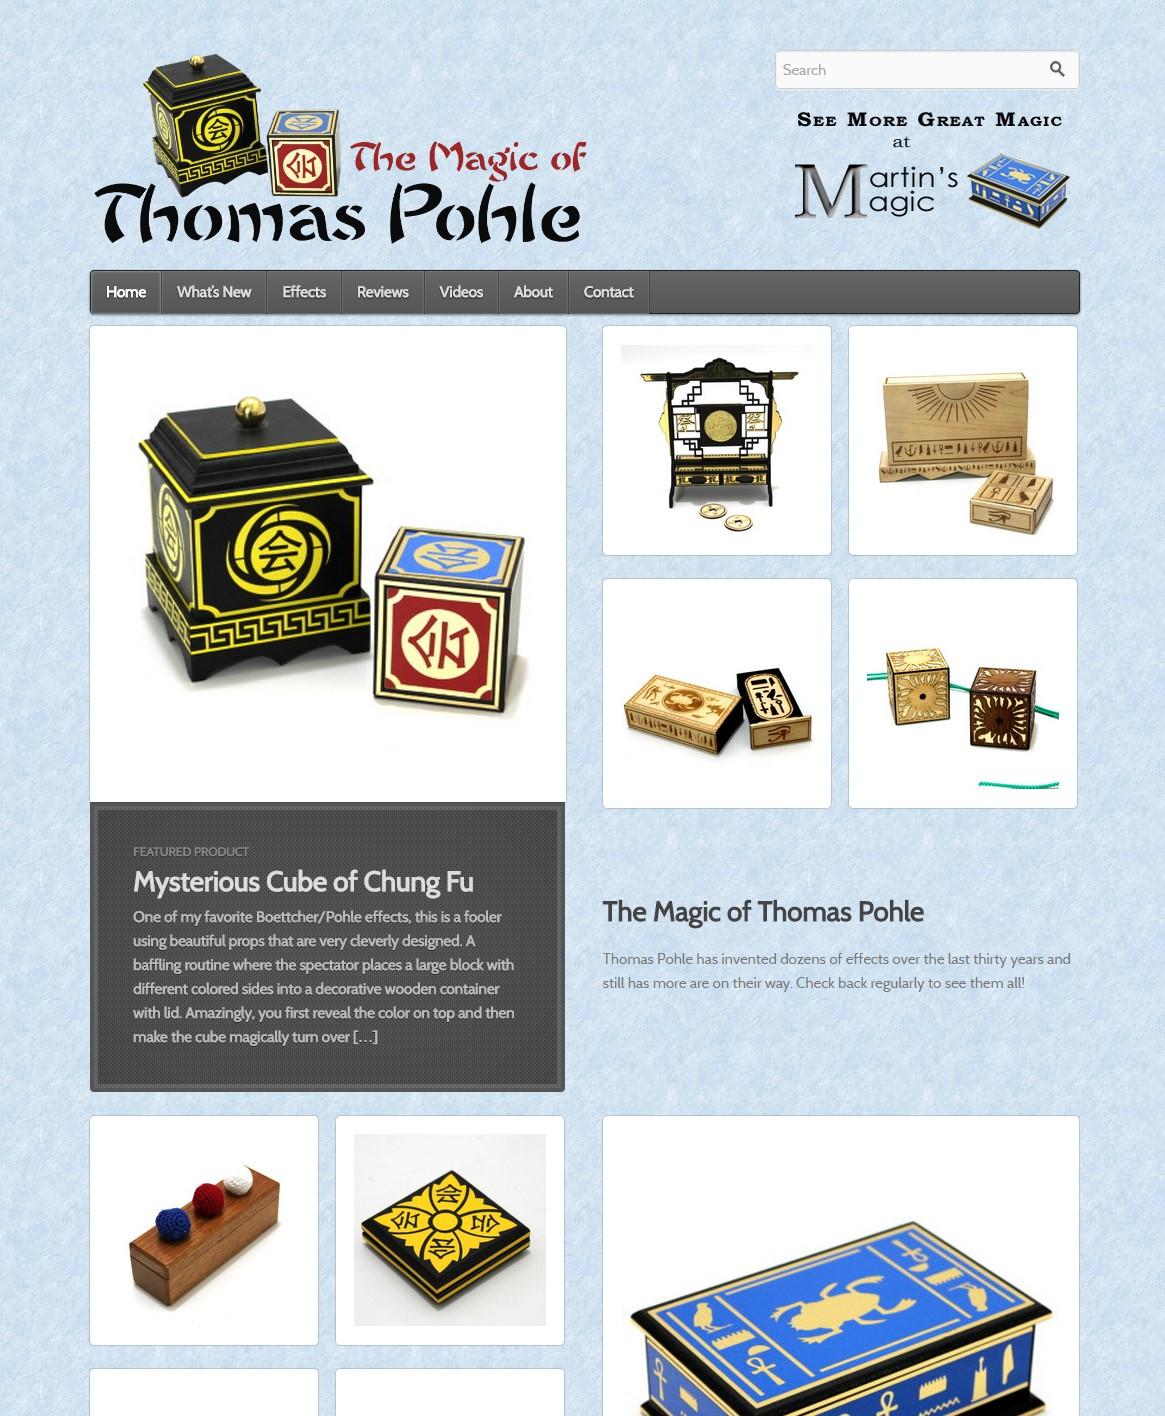 The Magic of Thomas Pohle